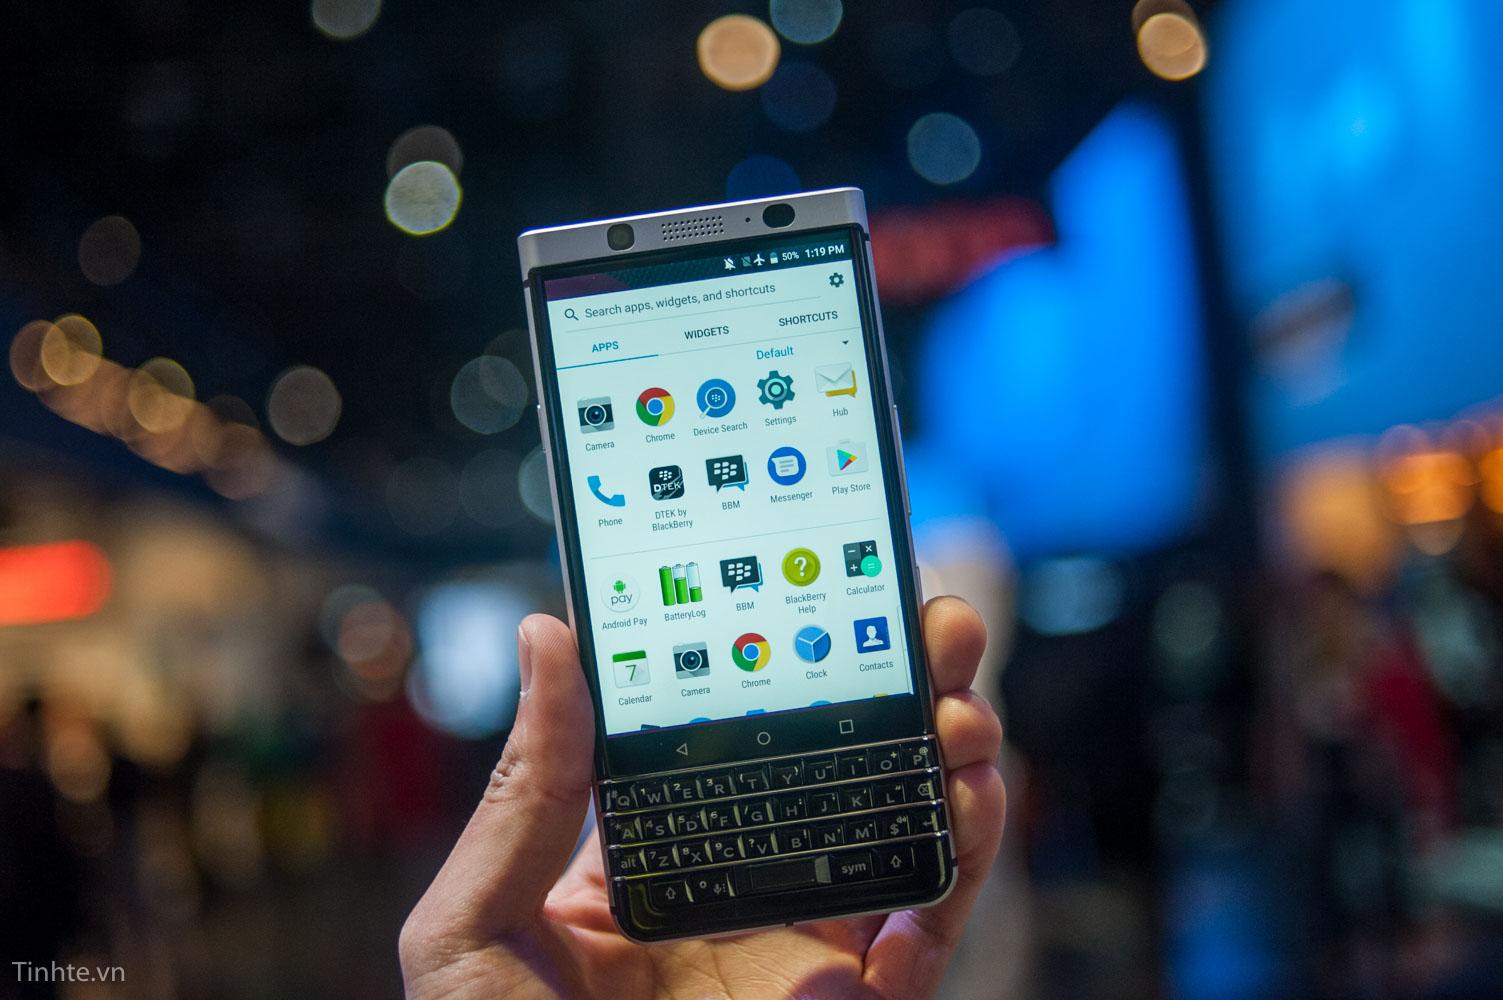 blackberry_mercury_tinhte.vn-7.jpg